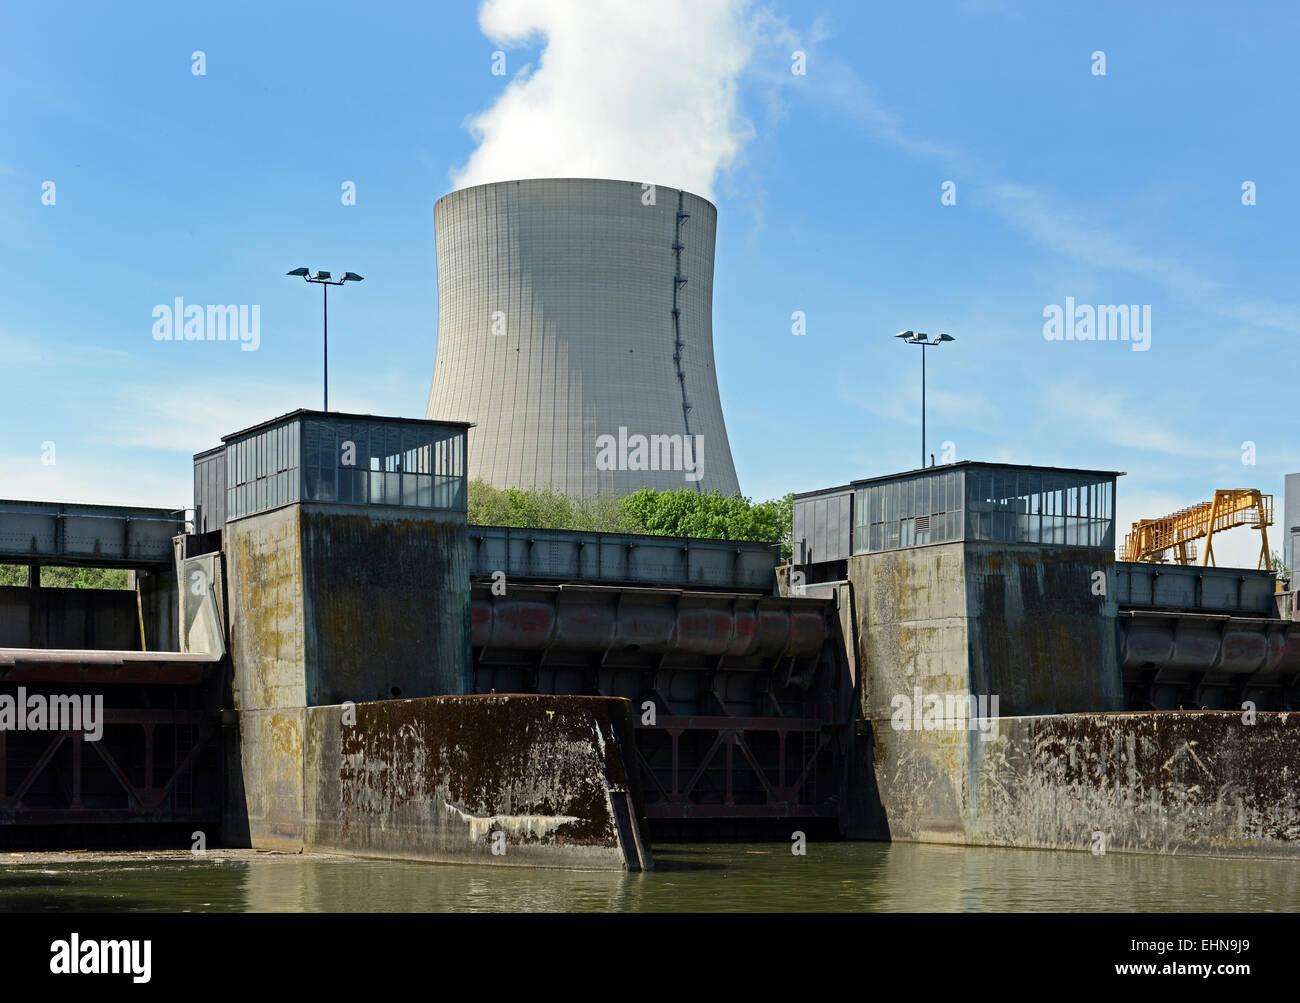 Atomkraftwerk / Nuclear reactor - Stock Image